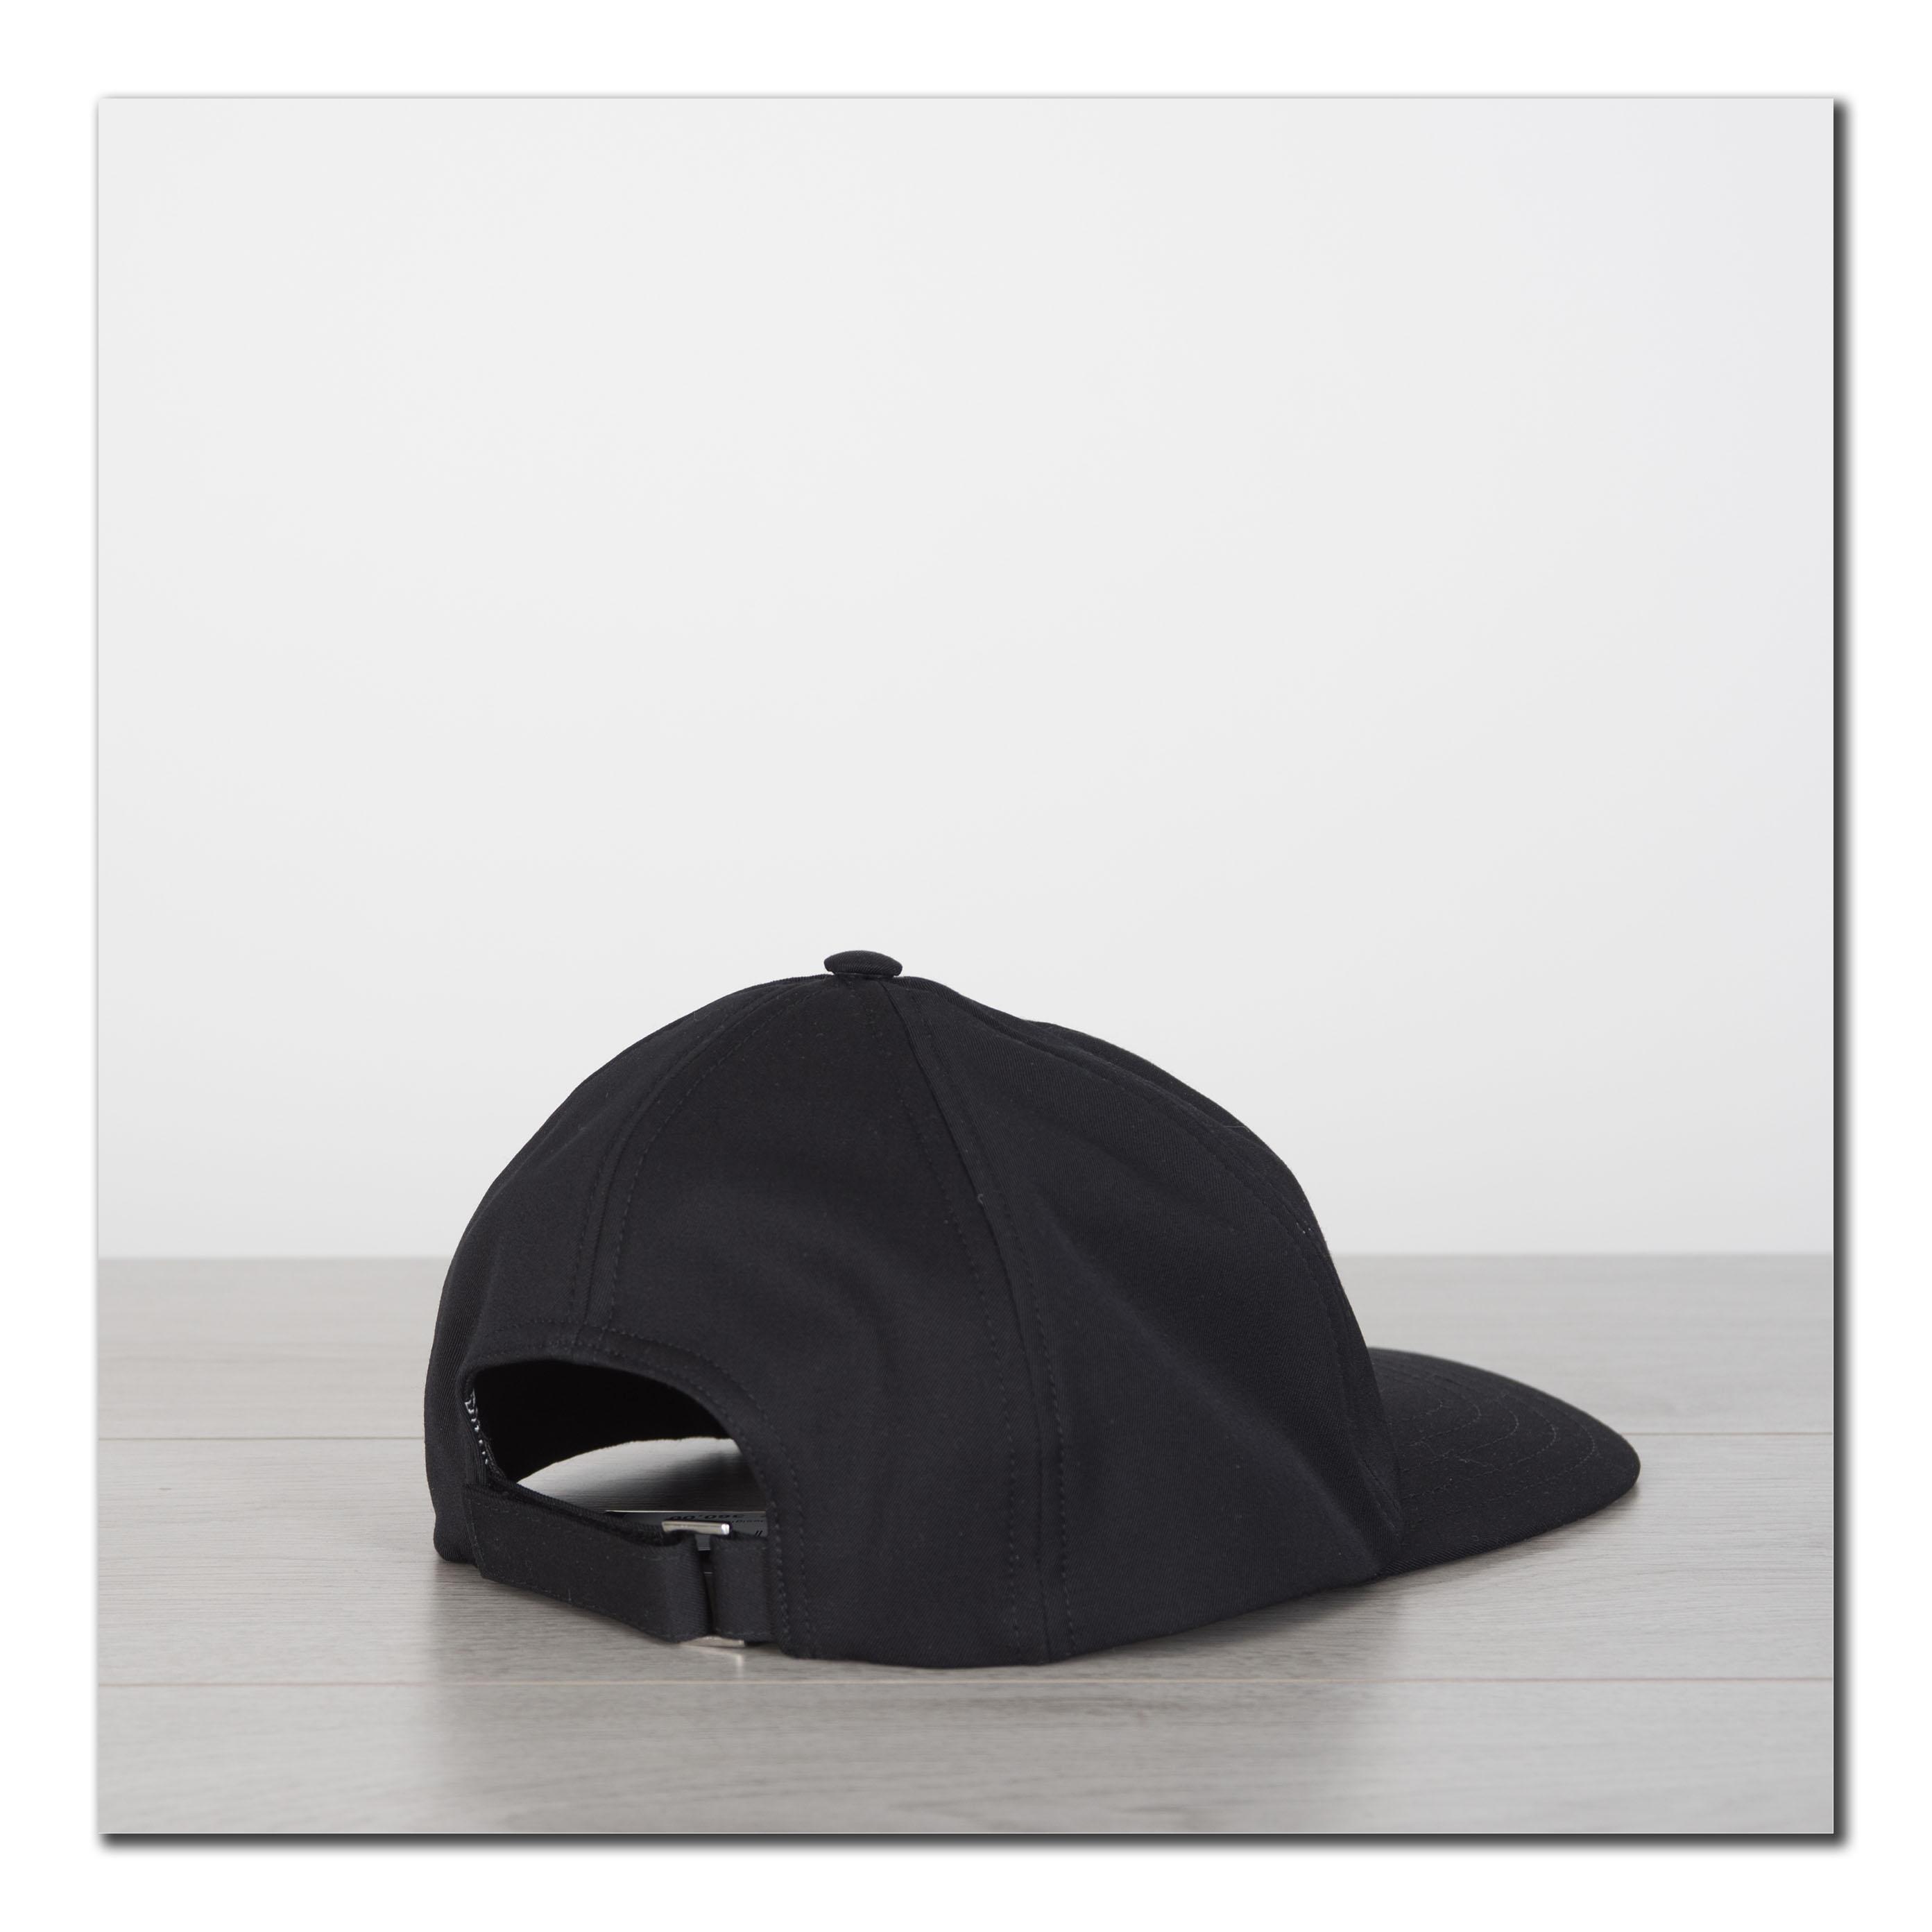 1a3cdfdeabc DIOR HOMME 480  Black Virgin Wool Baseball Cap with HARDIOR ...